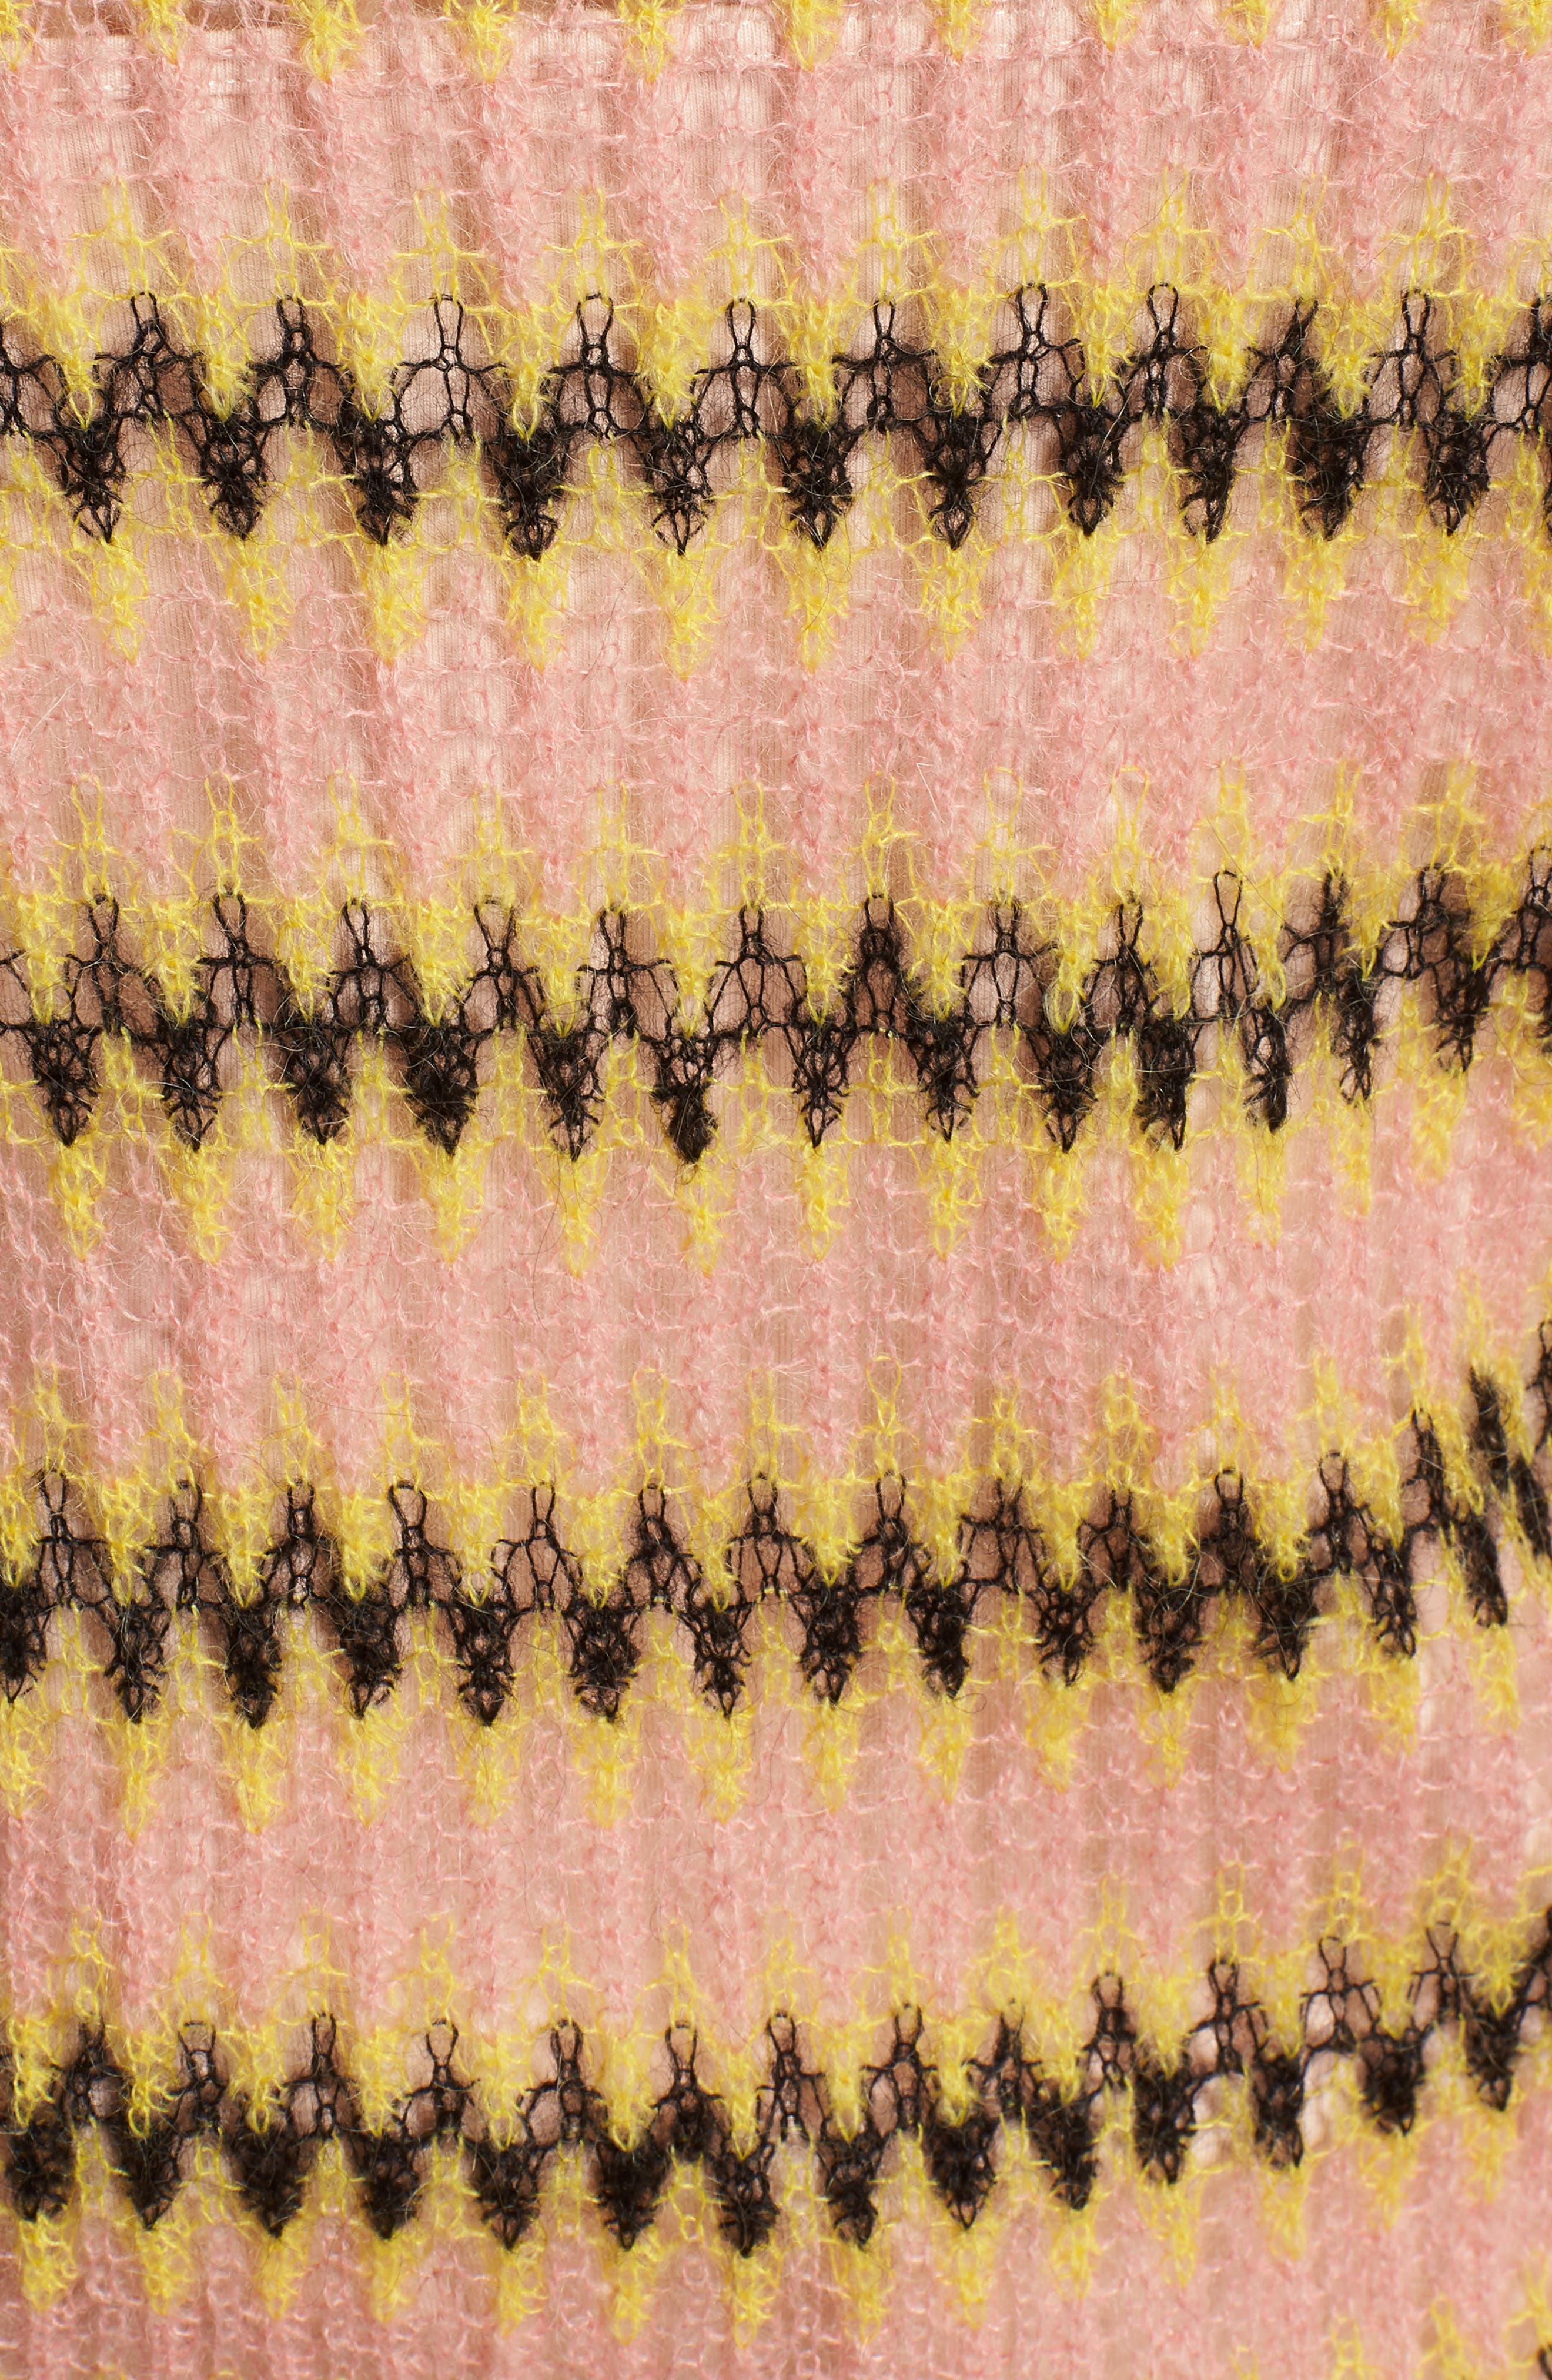 Zig Zag Wool Blend Sweater,                             Alternate thumbnail 5, color,                             MULTI PINK YELLOW ZIGZAG PRINT